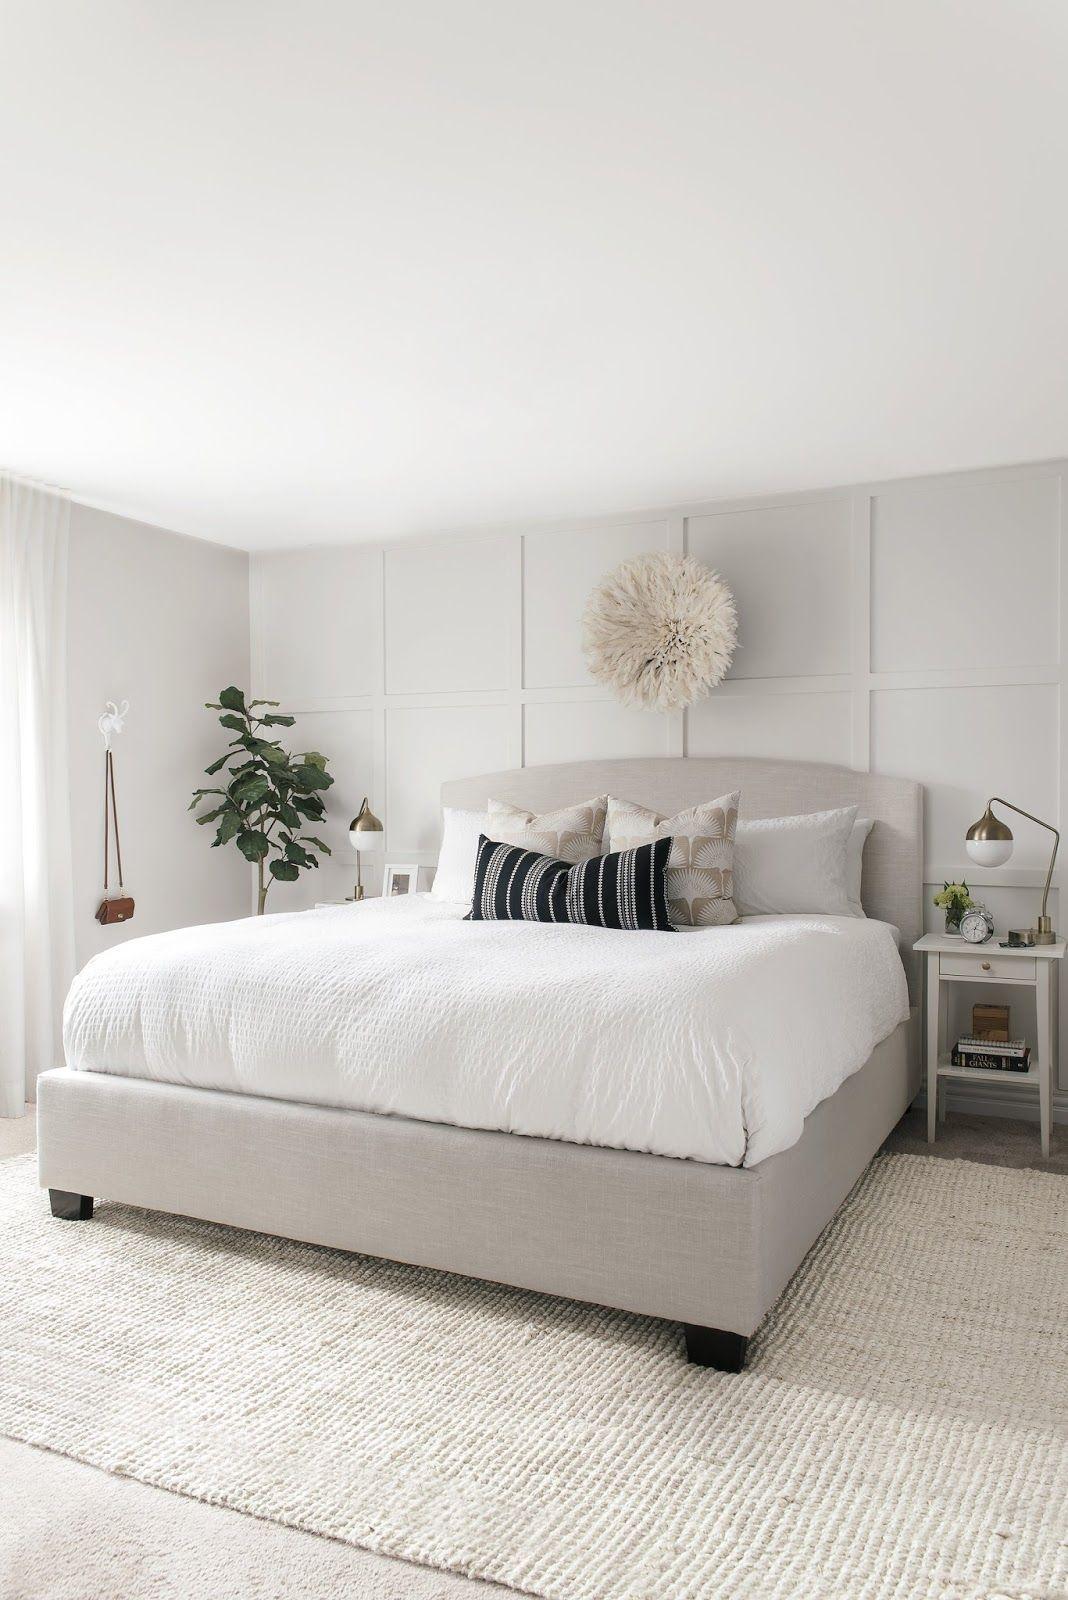 From Junk Room To Beautiful Bedroom The Big Reveal: One Room Challenge Master Bedroom- Week 6 The Reveal DIY